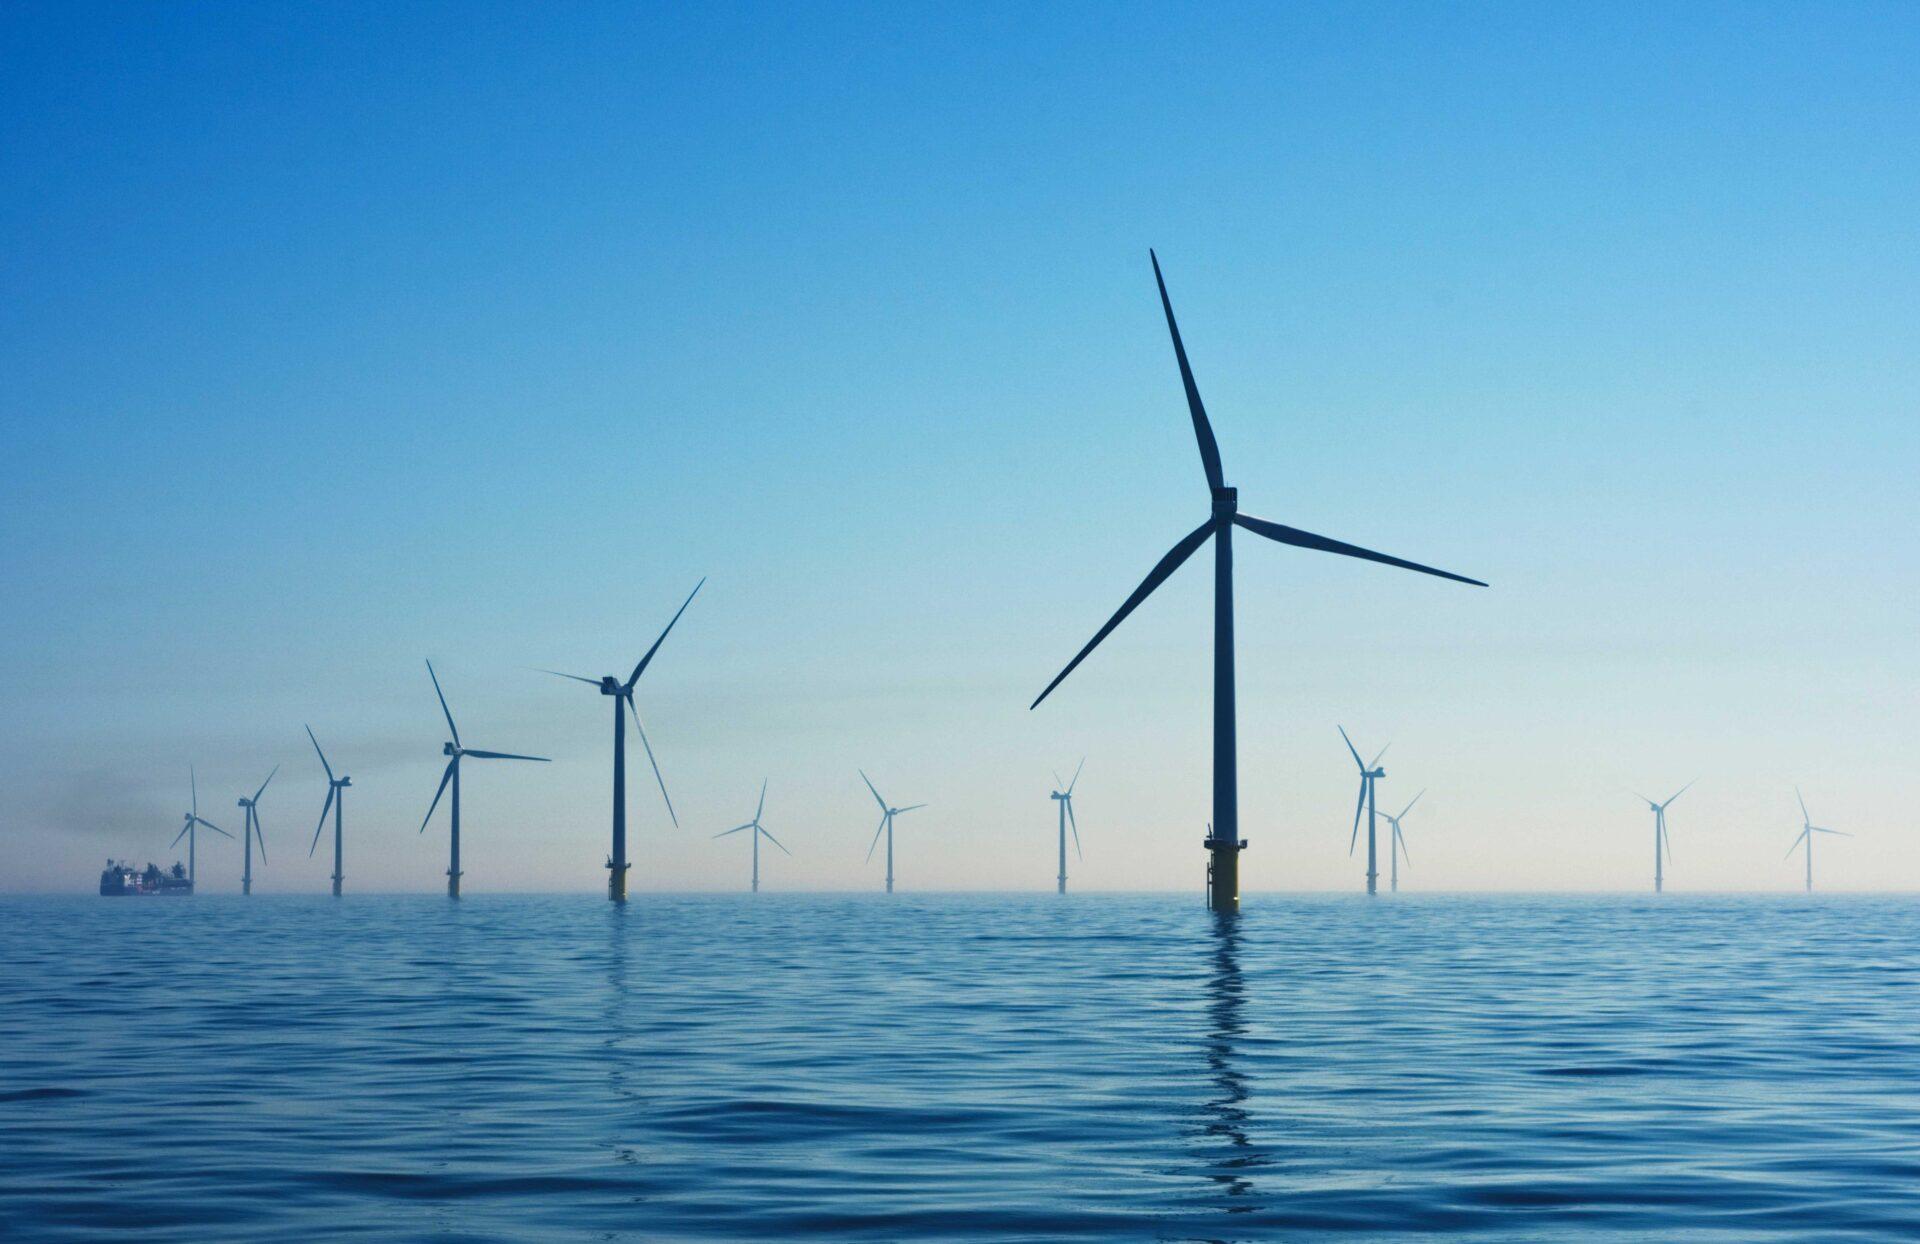 https://www.ccifrance-allemagne.fr/wp-content/uploads/2021/01/energie_eolienne_mer-scaled.jpg